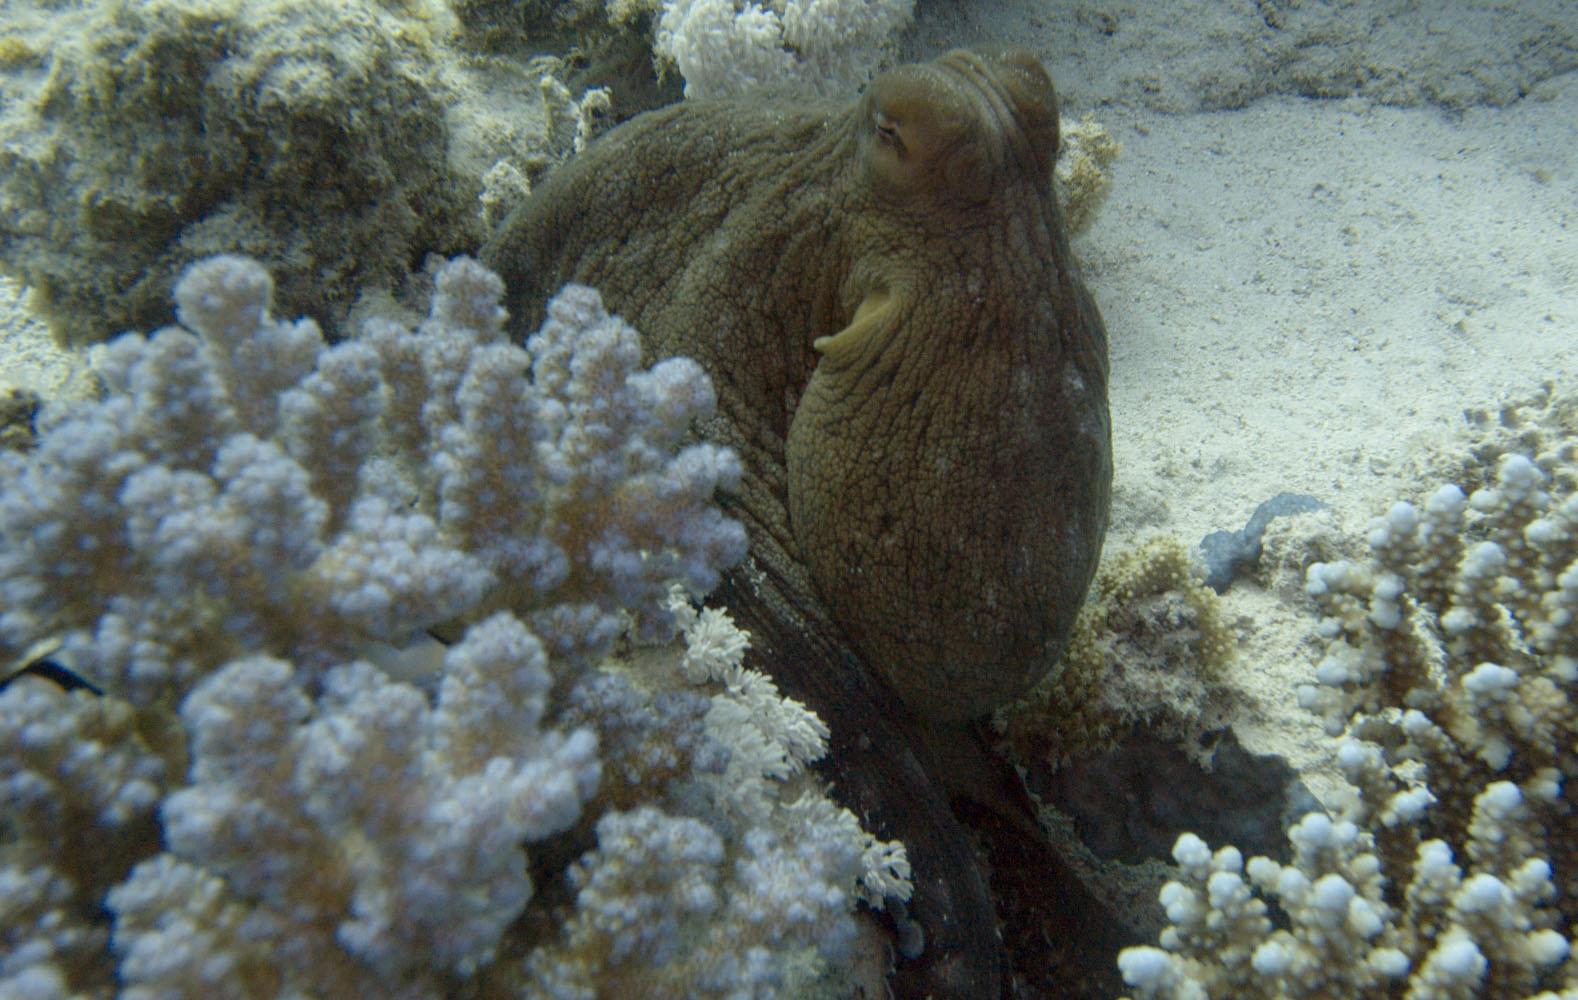 Marsa_Alam_Marsa_Shagra_Red Sea Diving Safari-8